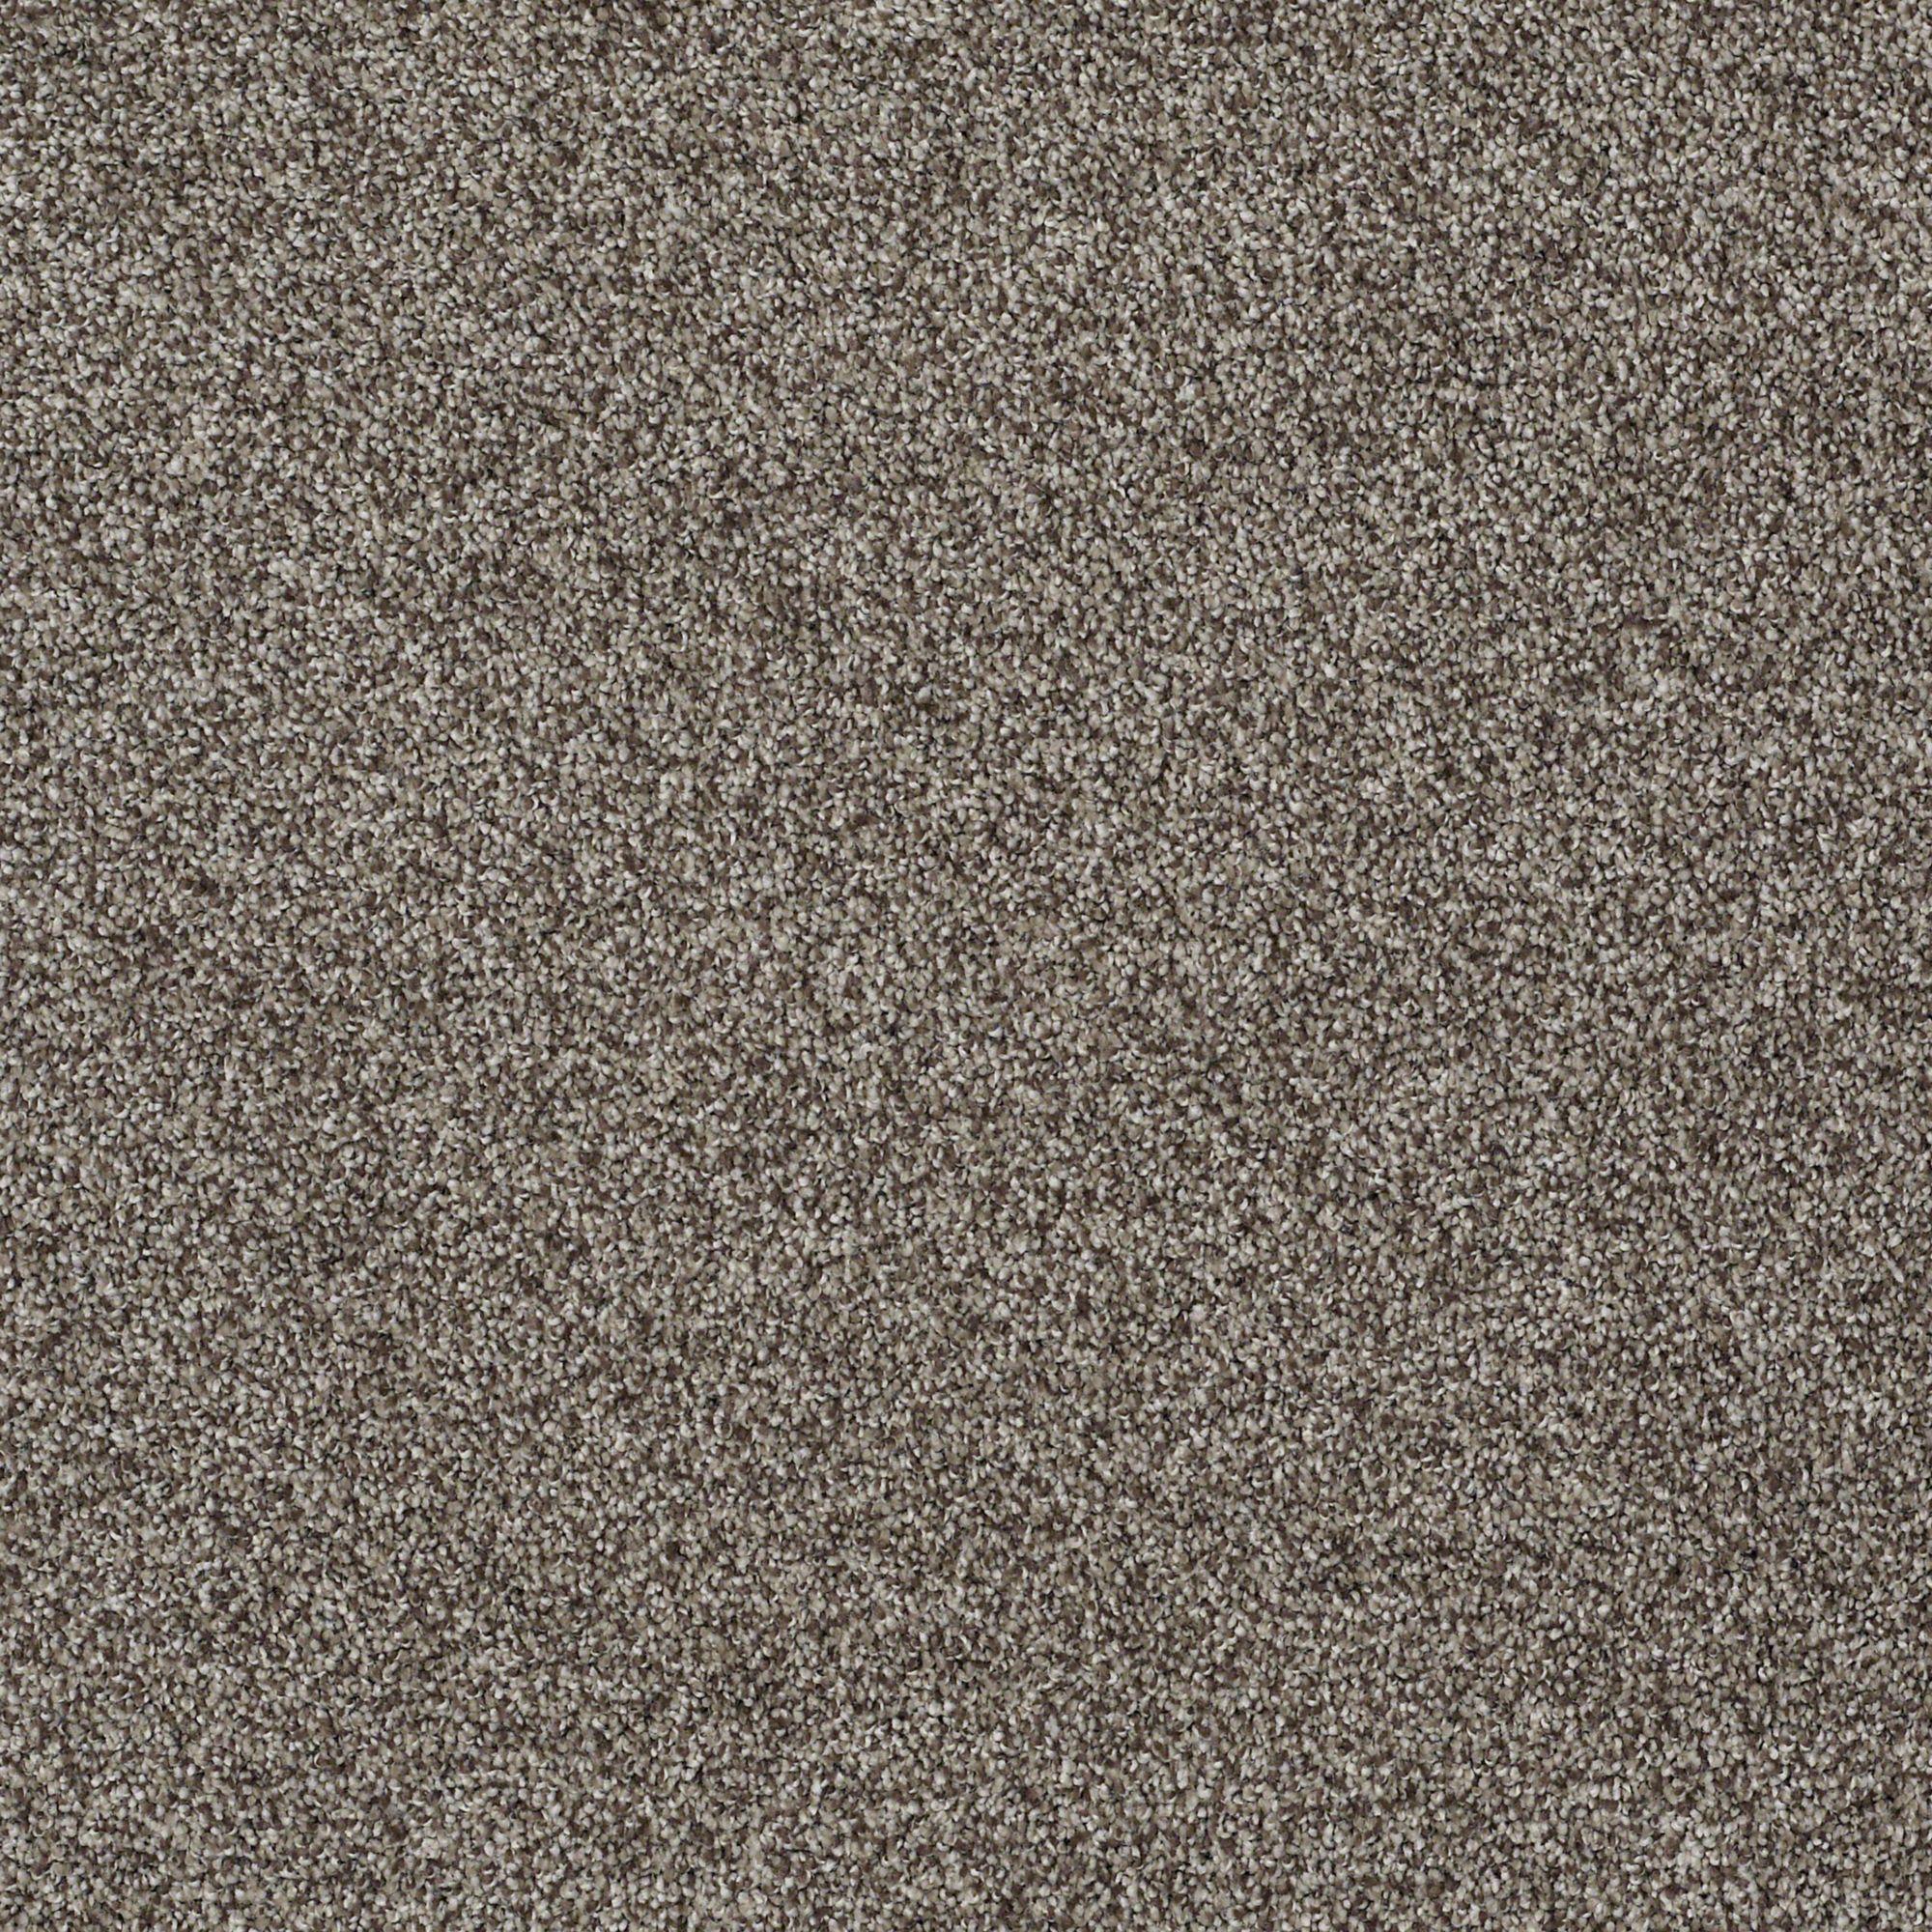 Totally Convinced Flax Carpet tiles, Carpet, Flooring